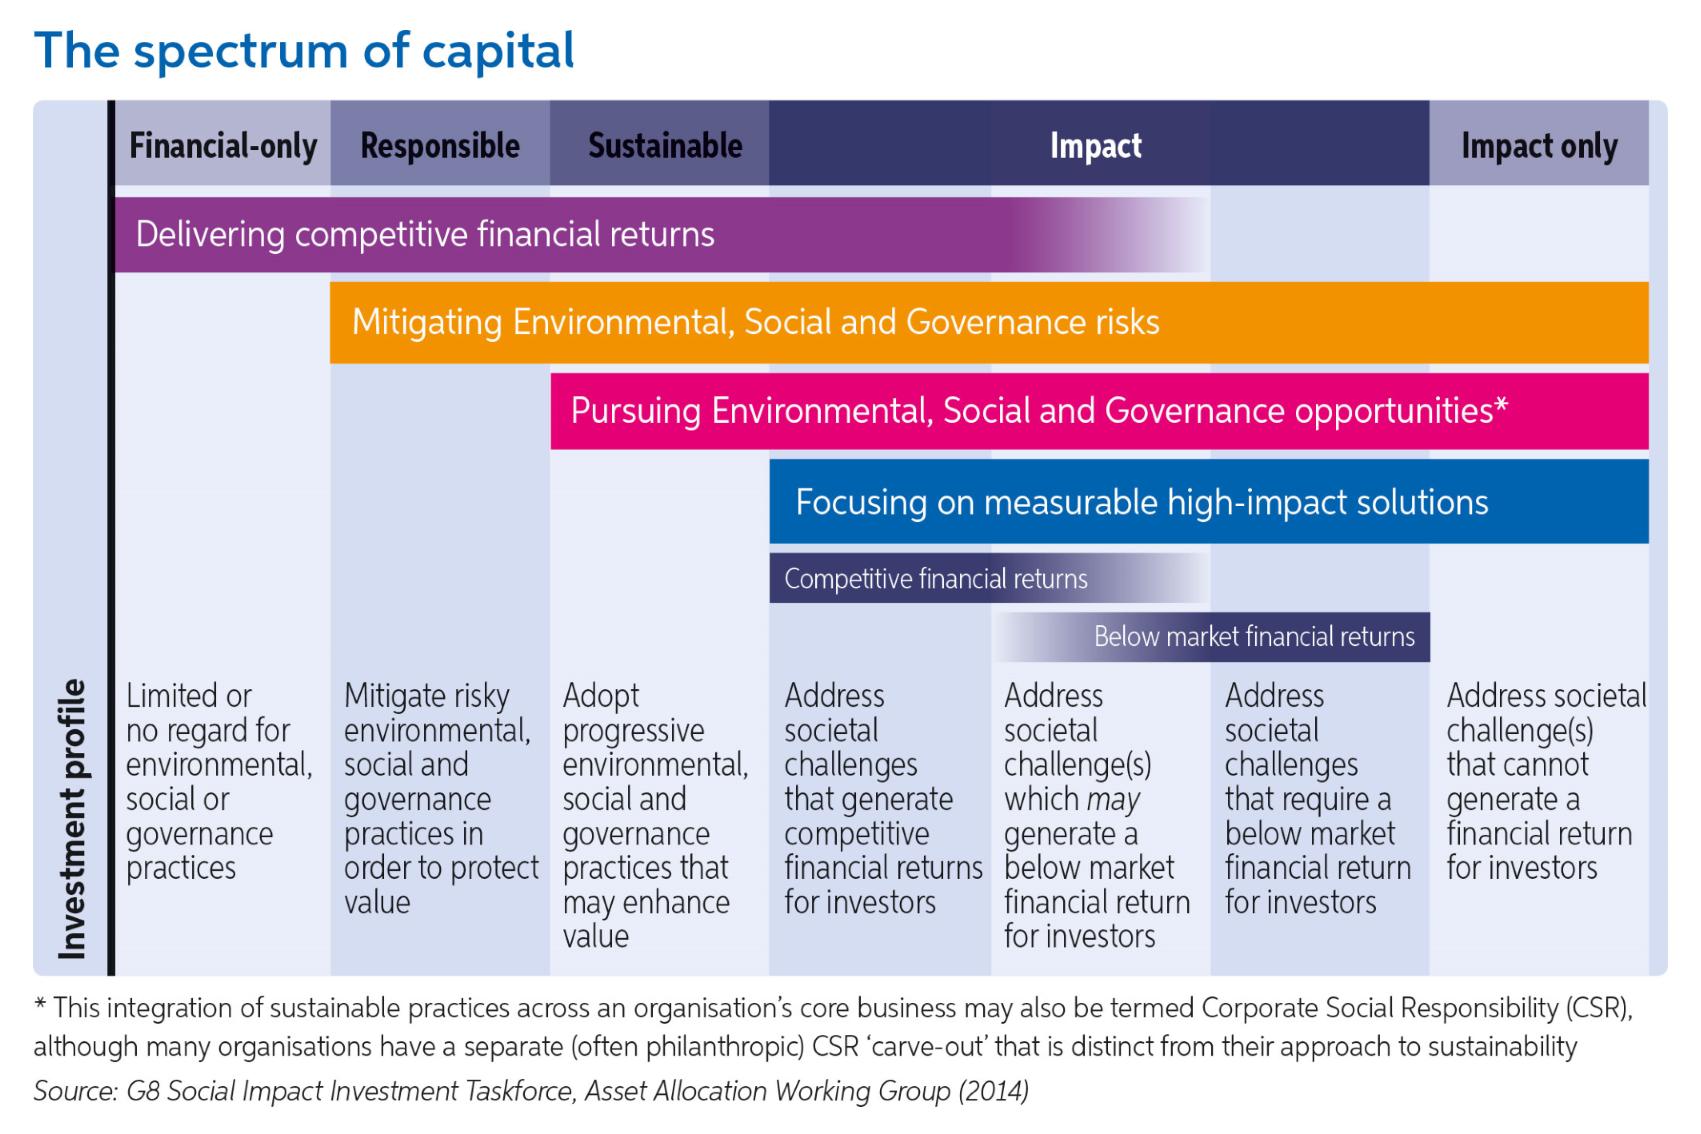 Phakamani impact capital investments investment using technical analysis and fuzzy logic washing